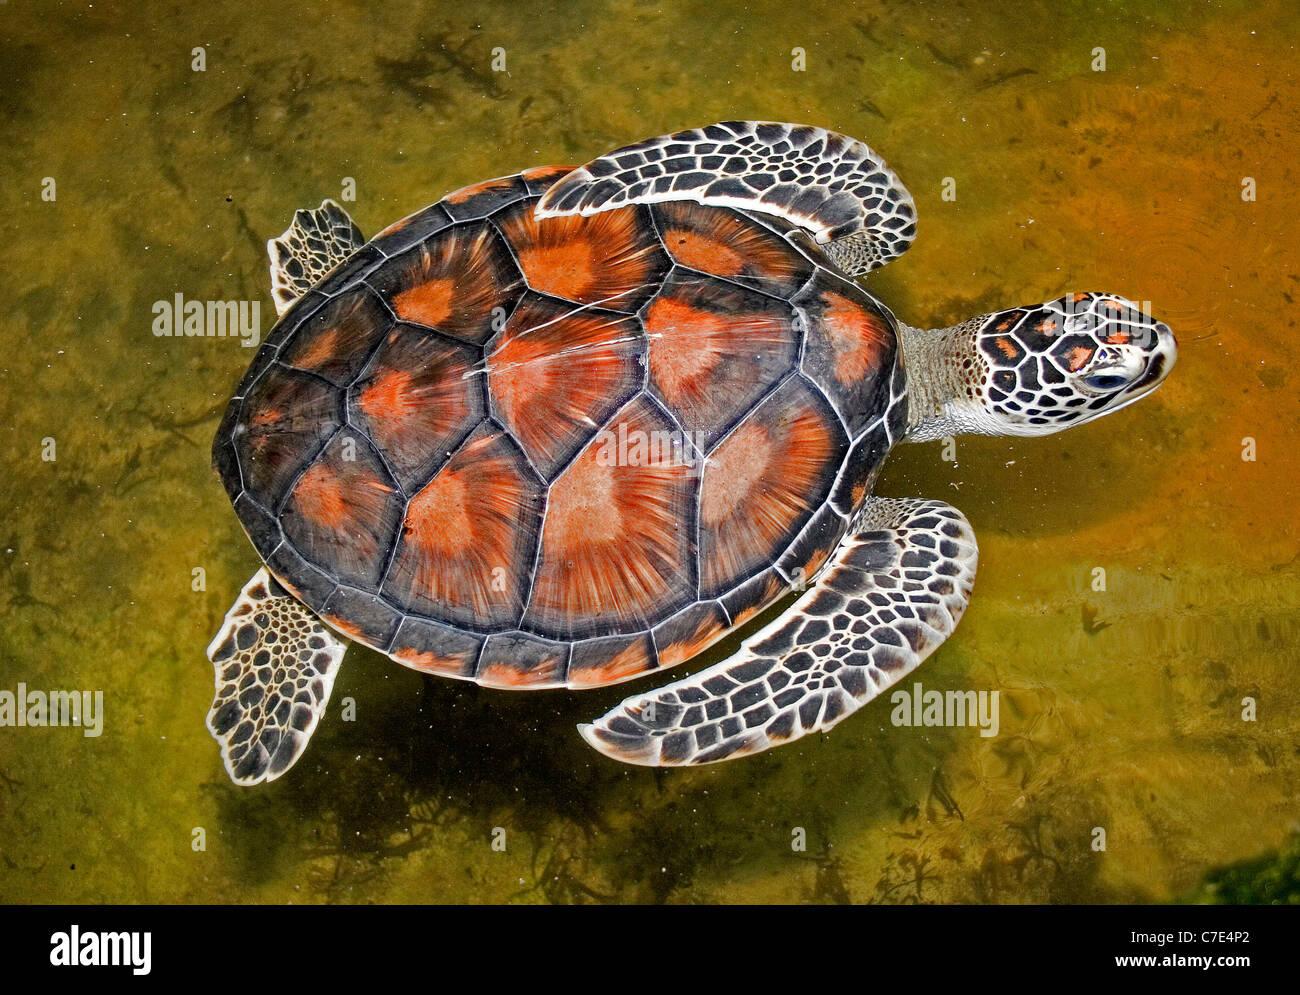 Olive Ridley turtlelepidochelys olivacea Sri Lanka - Stock Image